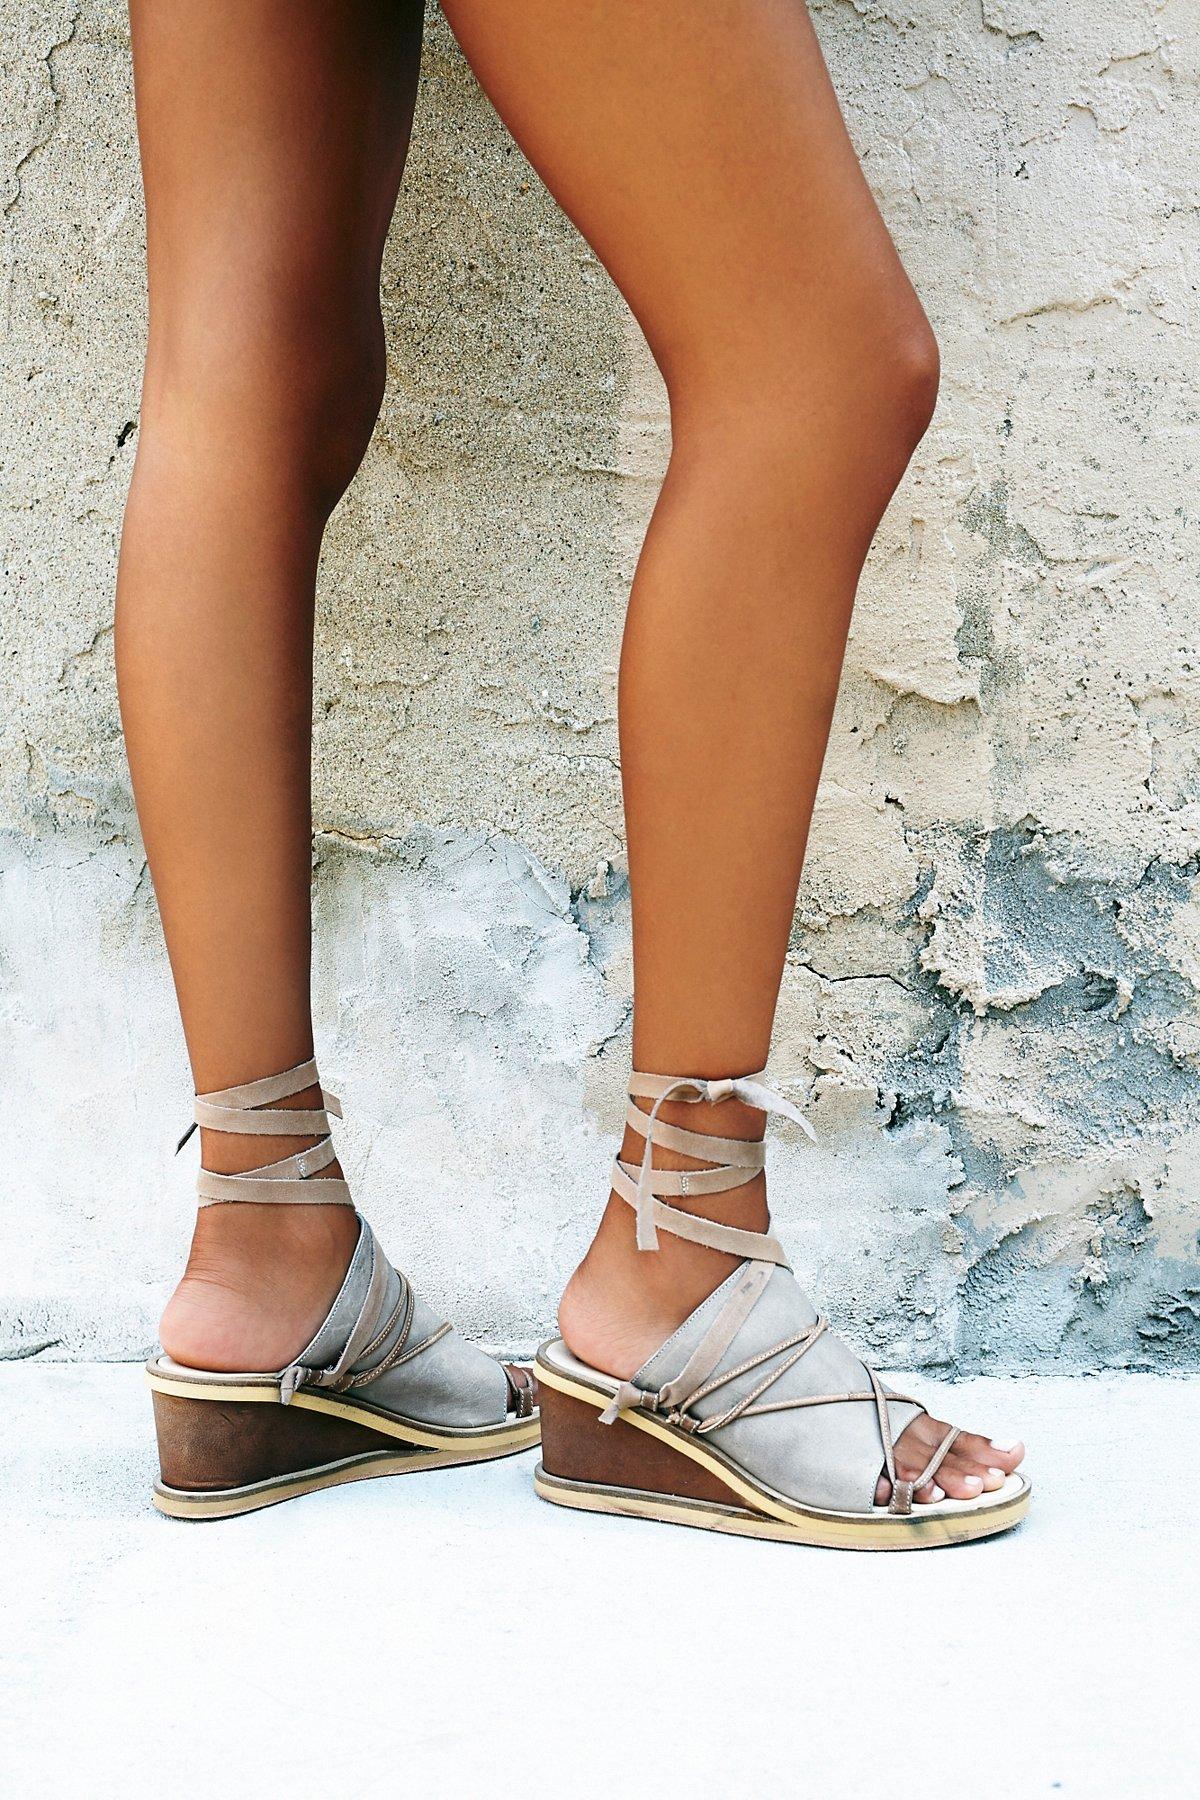 Bowery坡跟鞋